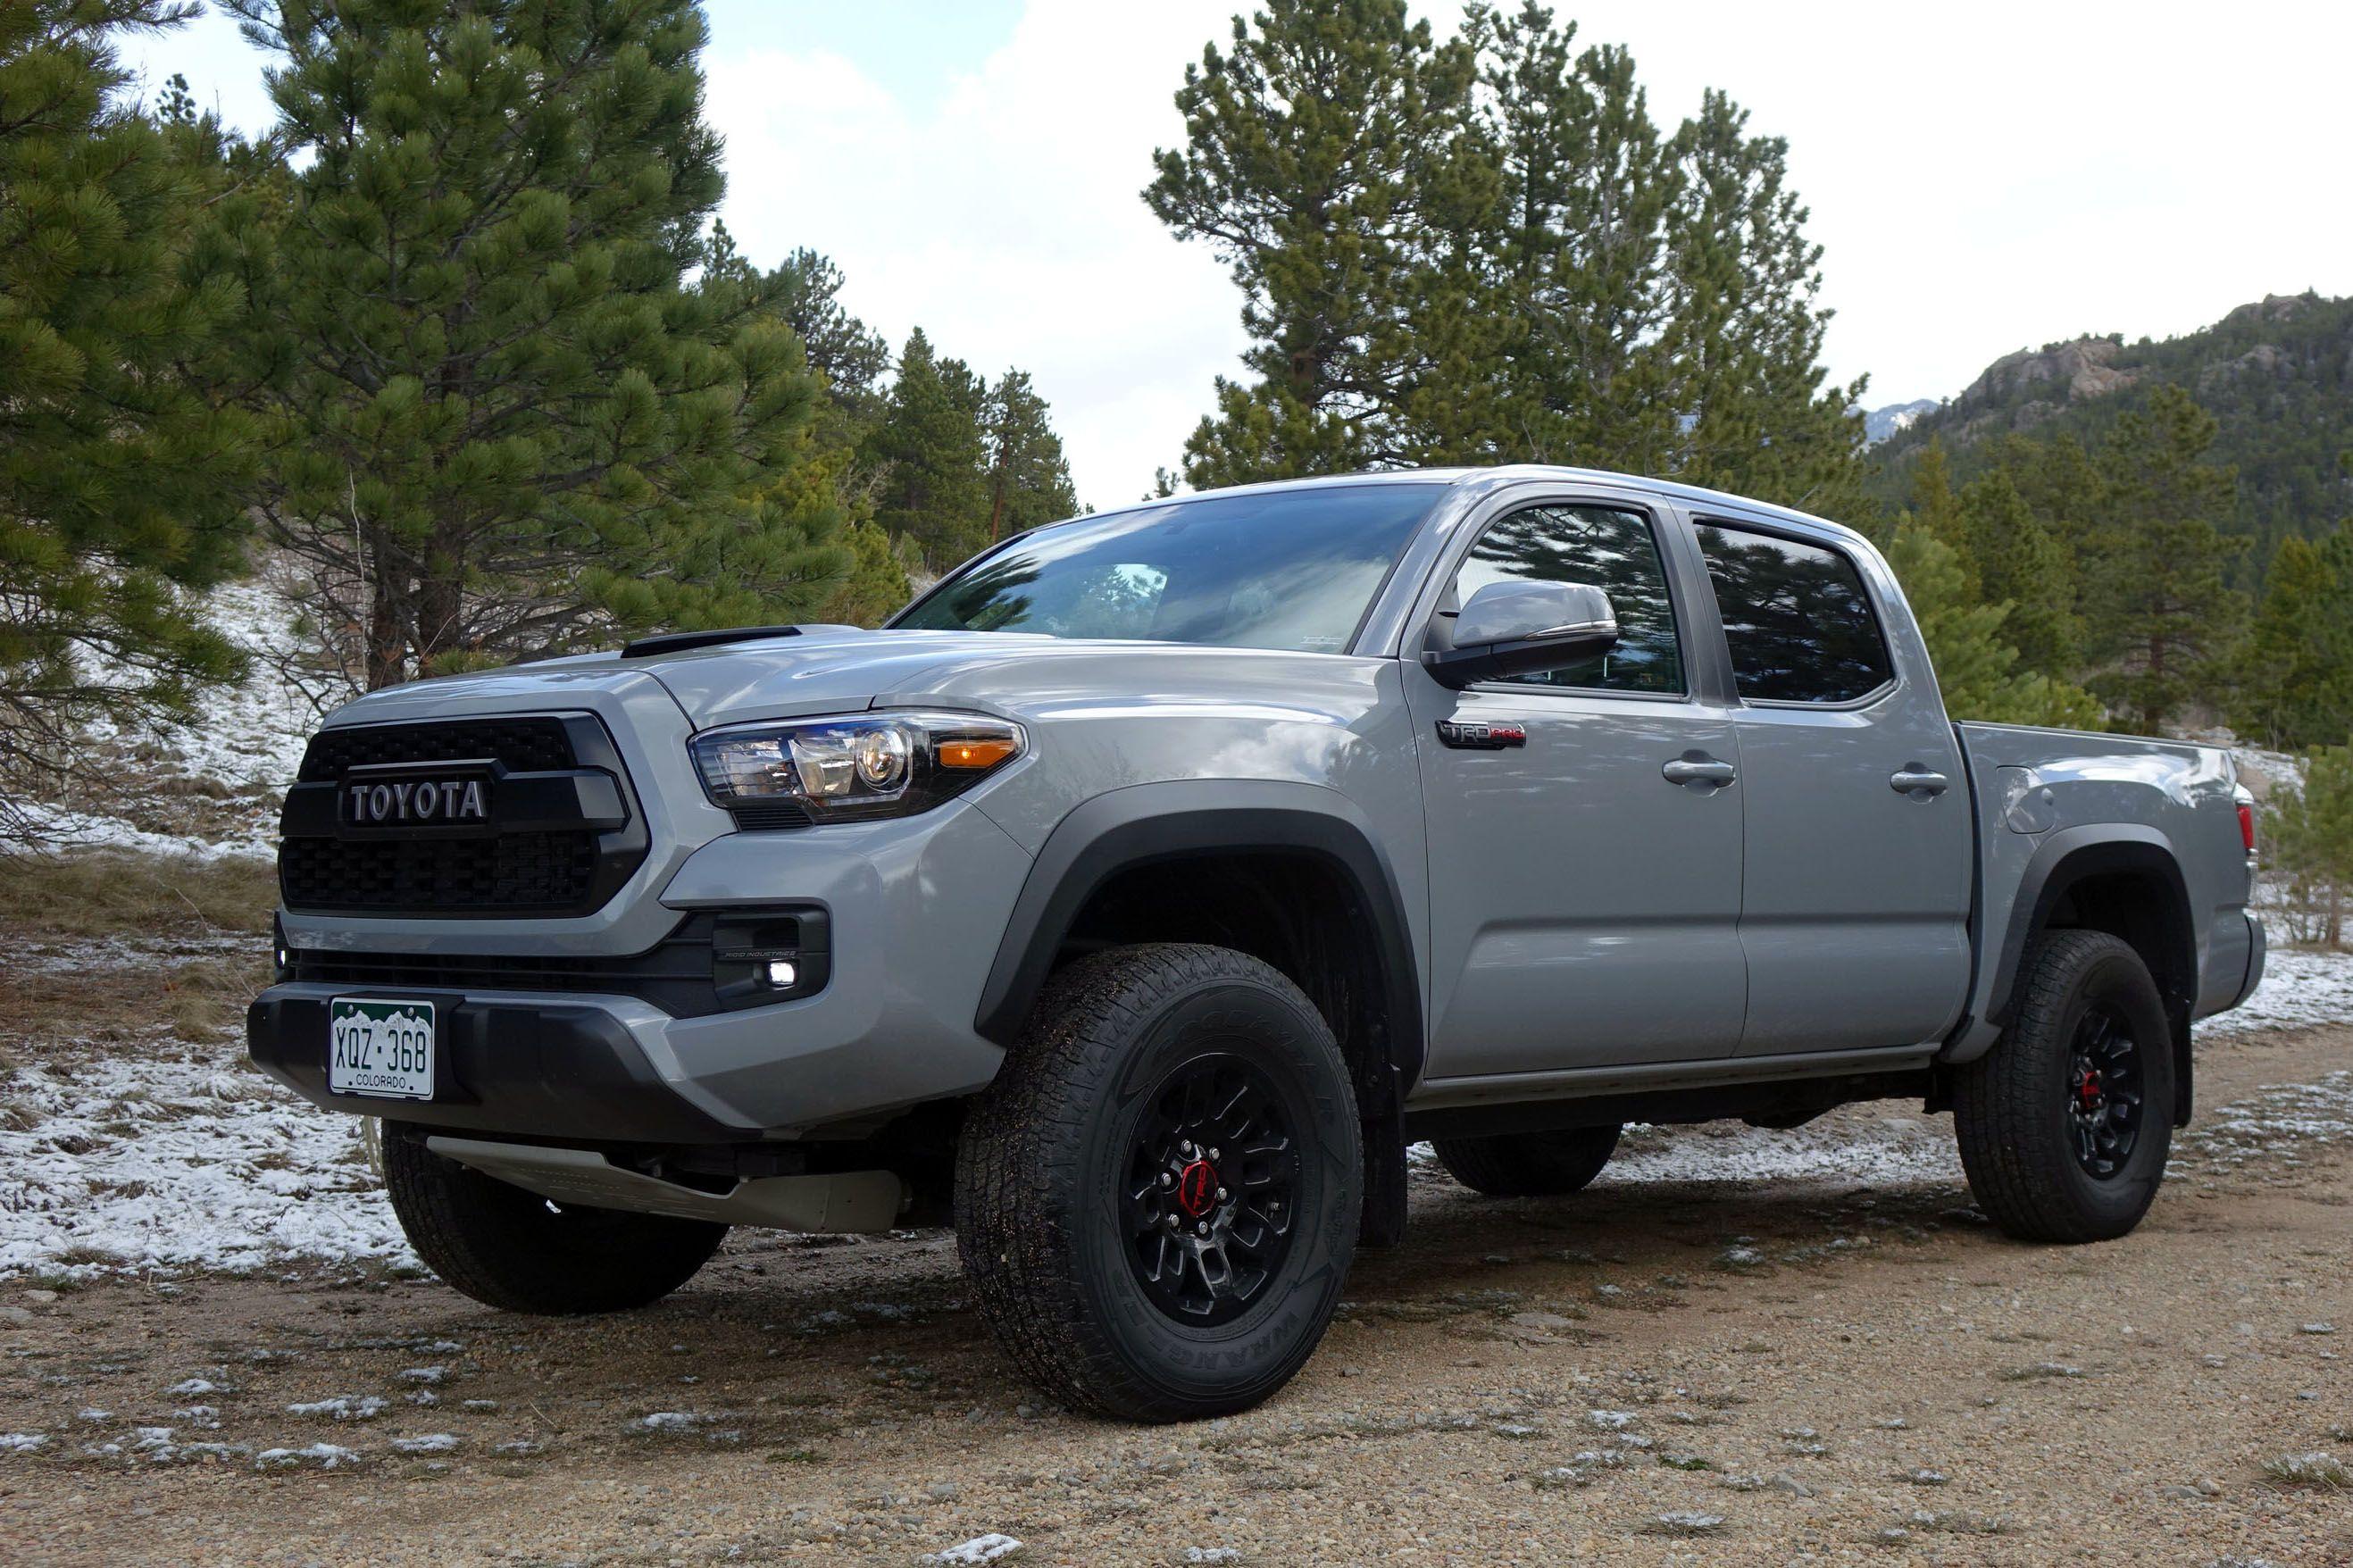 2020 Toyota Tacoma Diesel Trd Pro Spesification